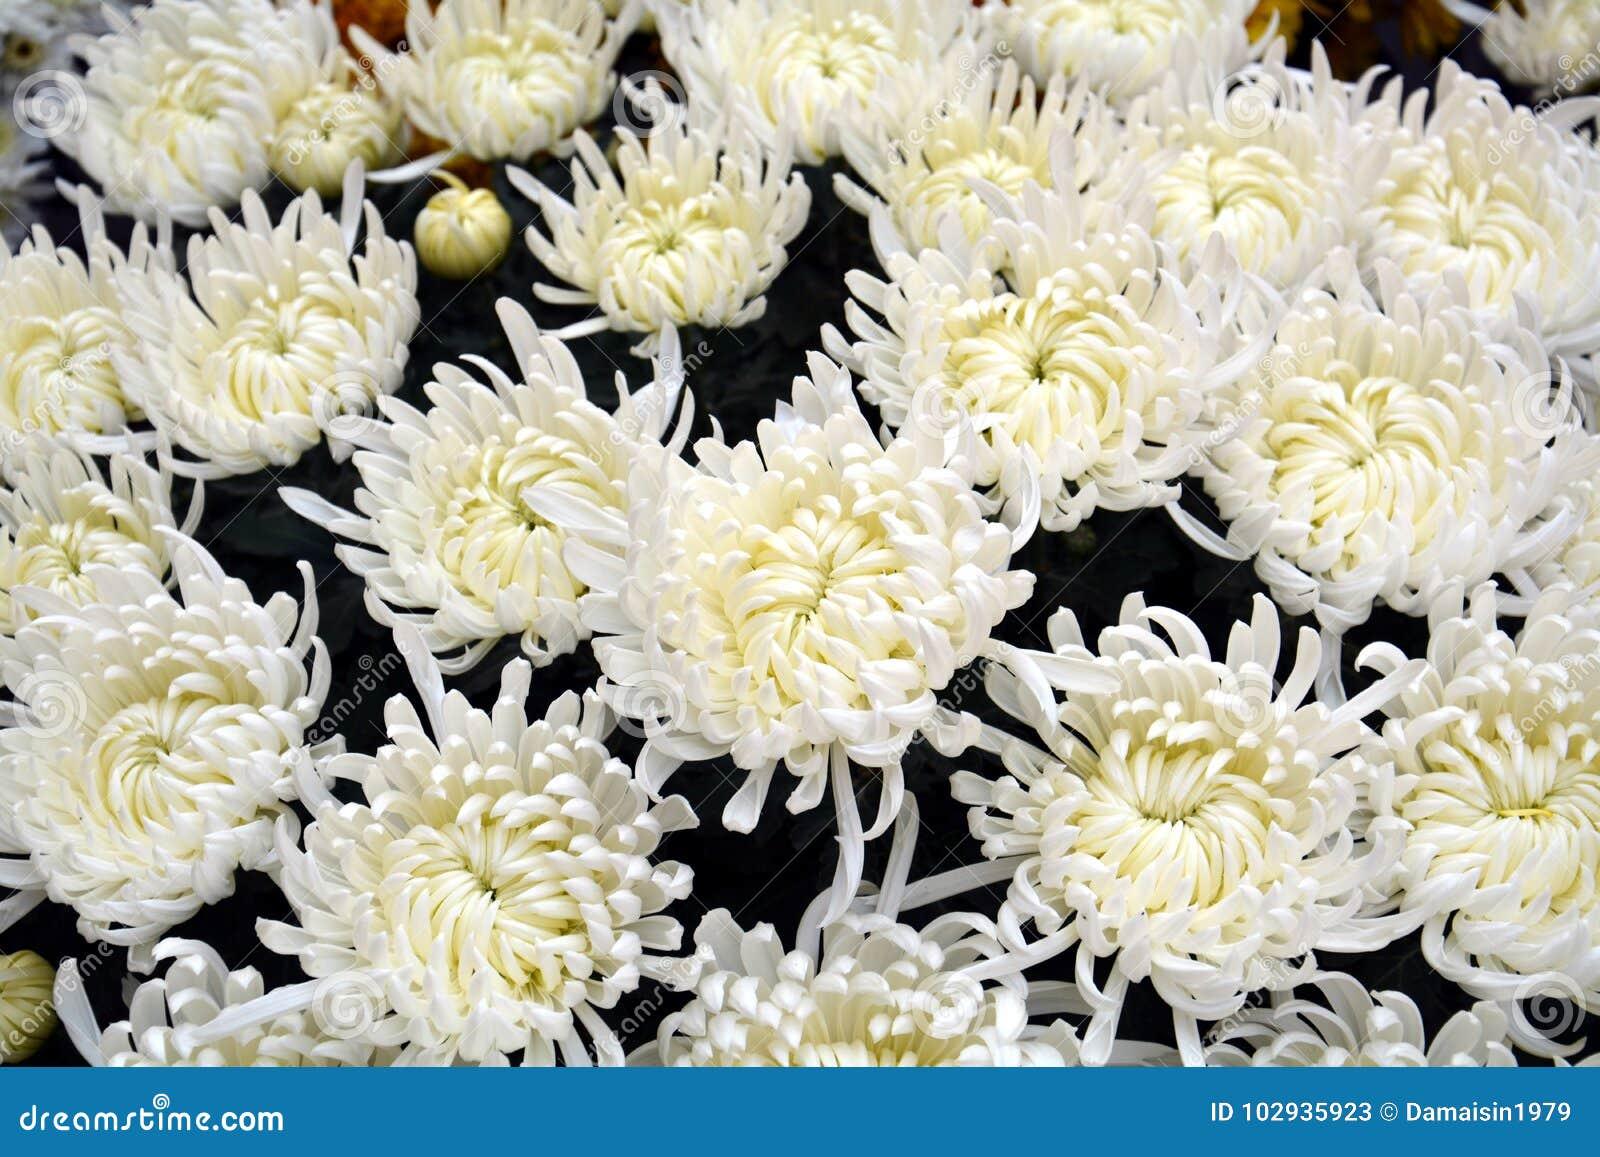 Beautiful Fresh White Flowers Petals Natural Background Garden